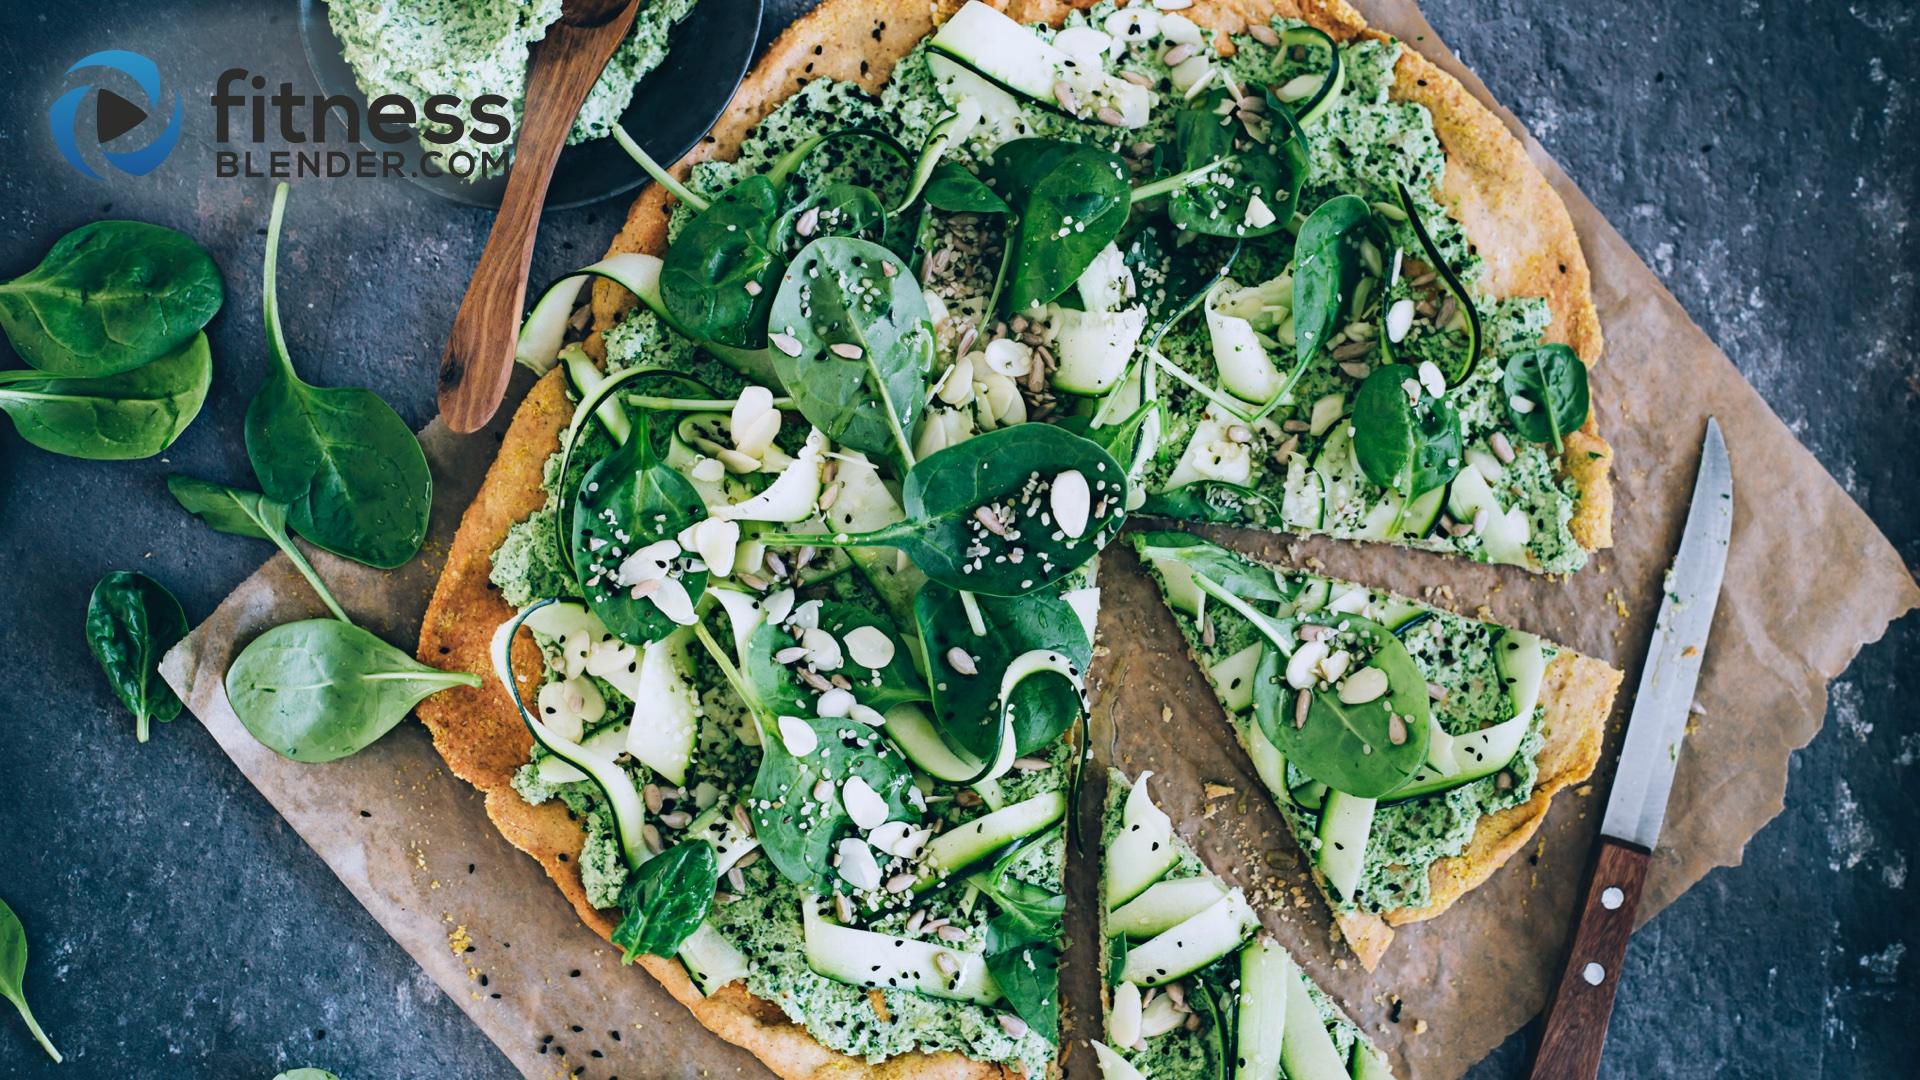 Green Power Pizza with Chickpea Crust (Vegan, Gluten-Free)